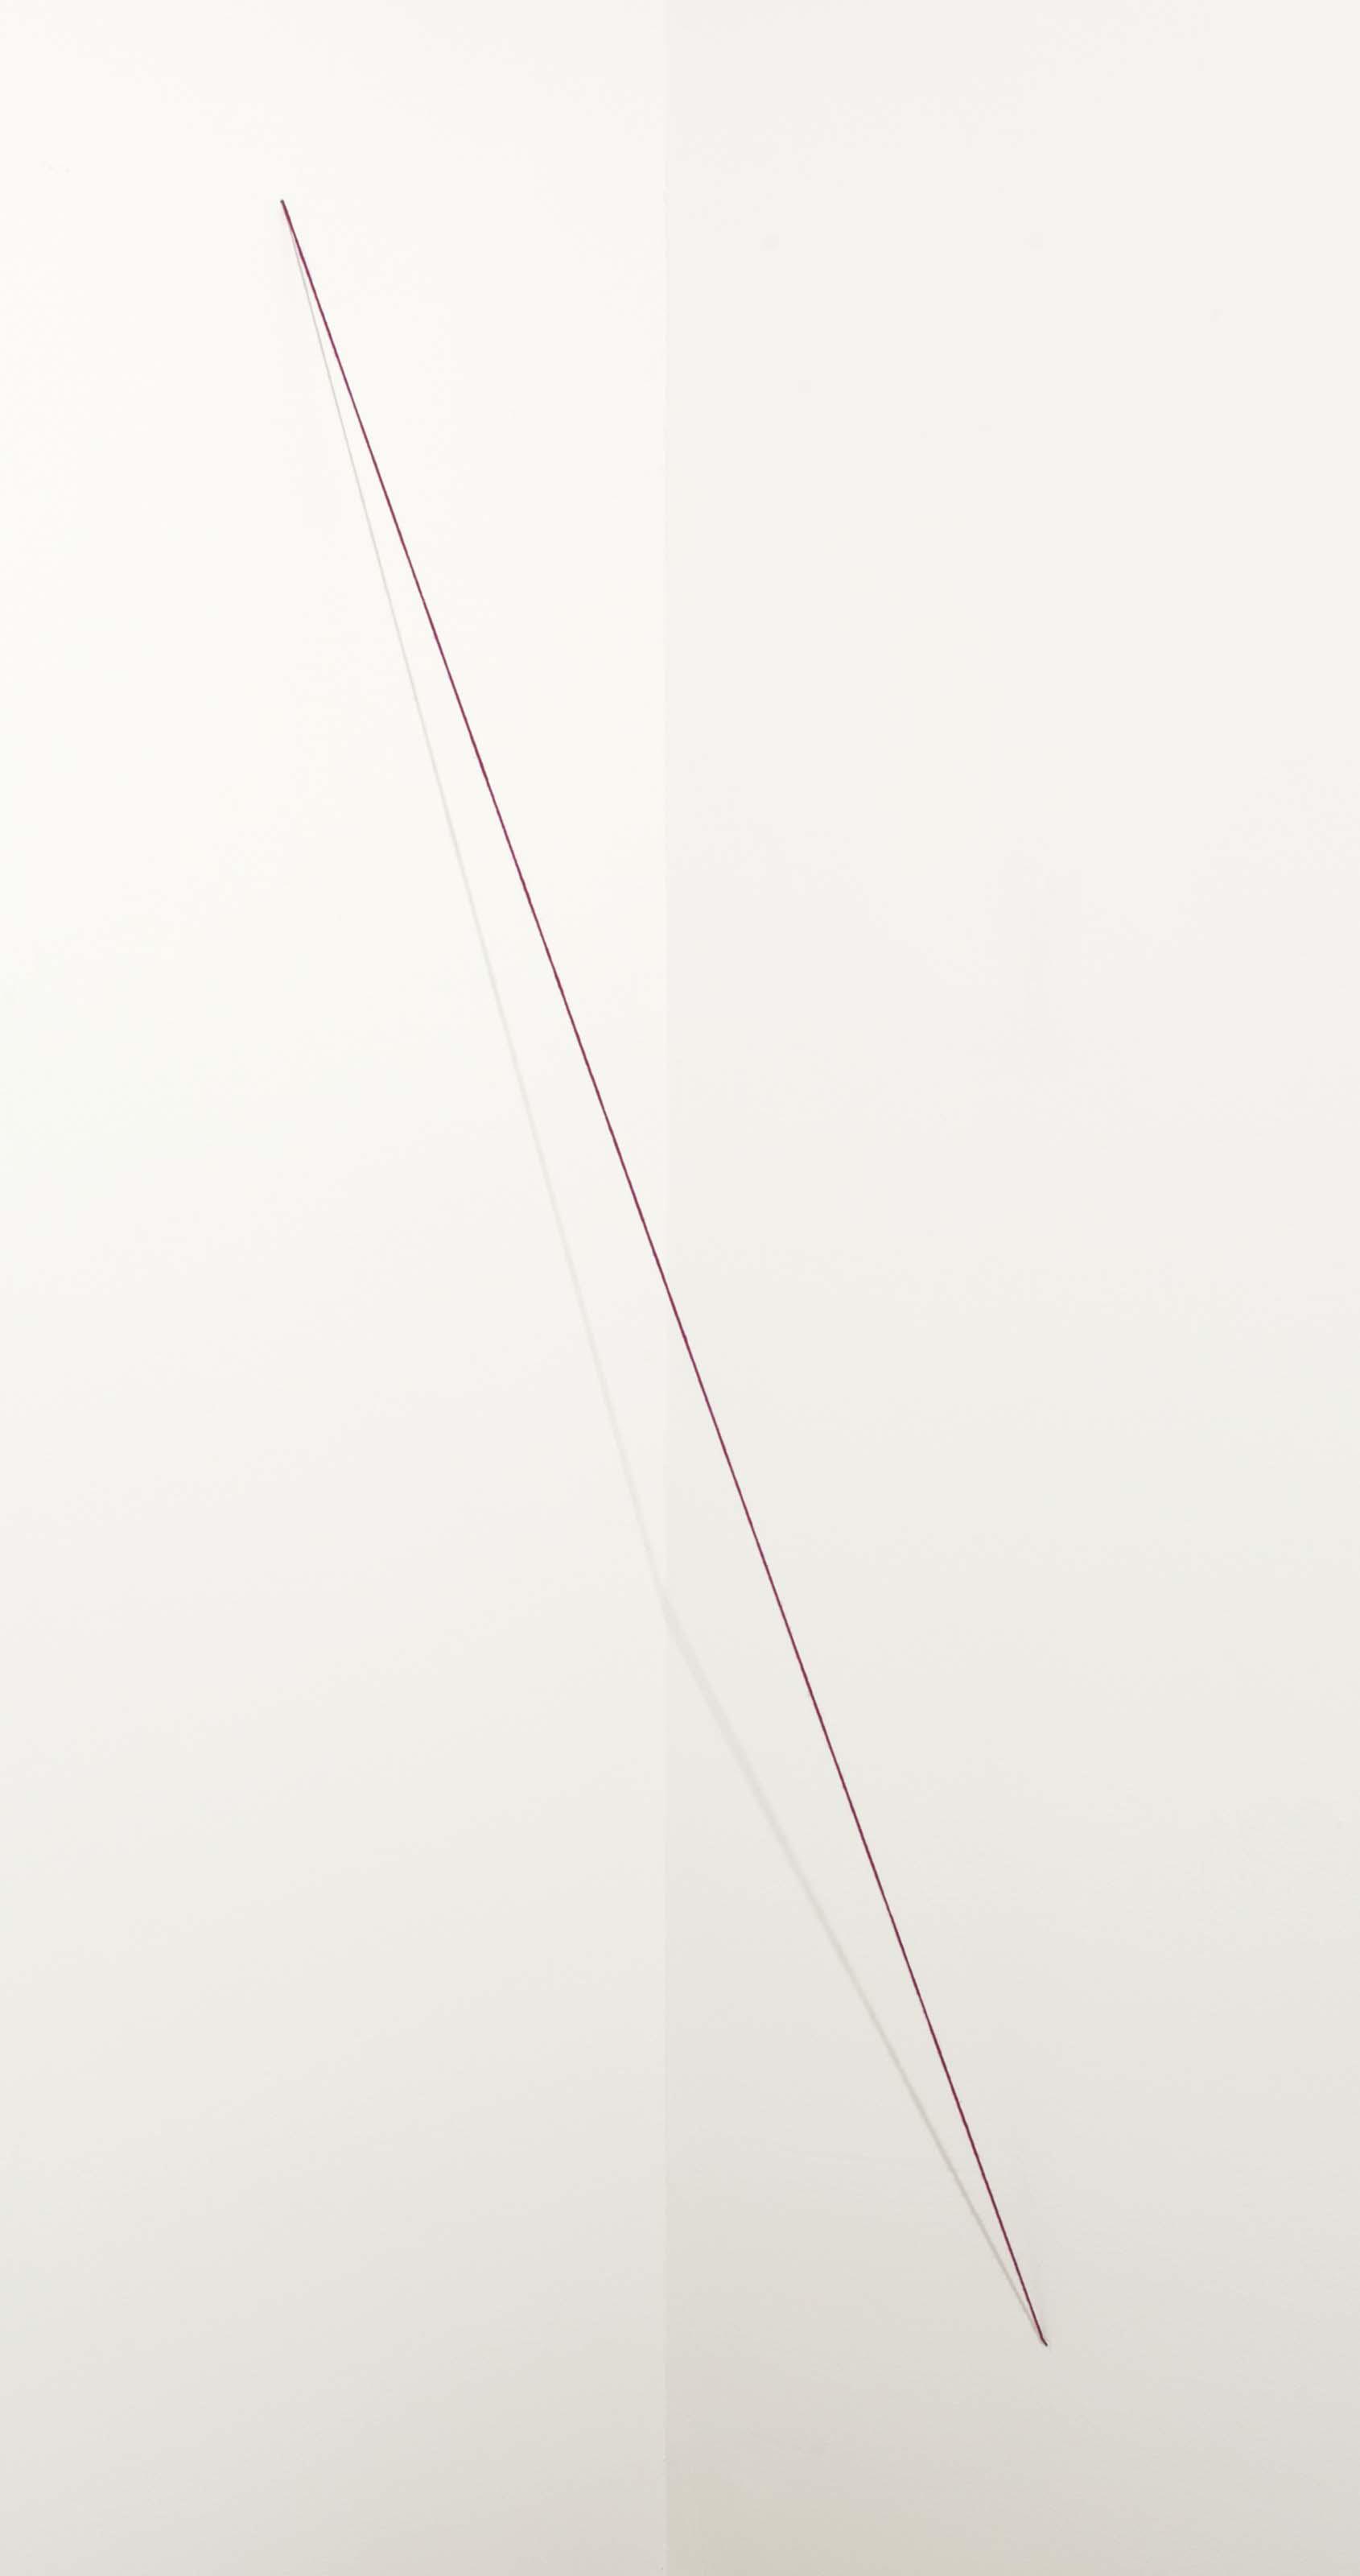 Untitled (Diagonal Cornered Construction)